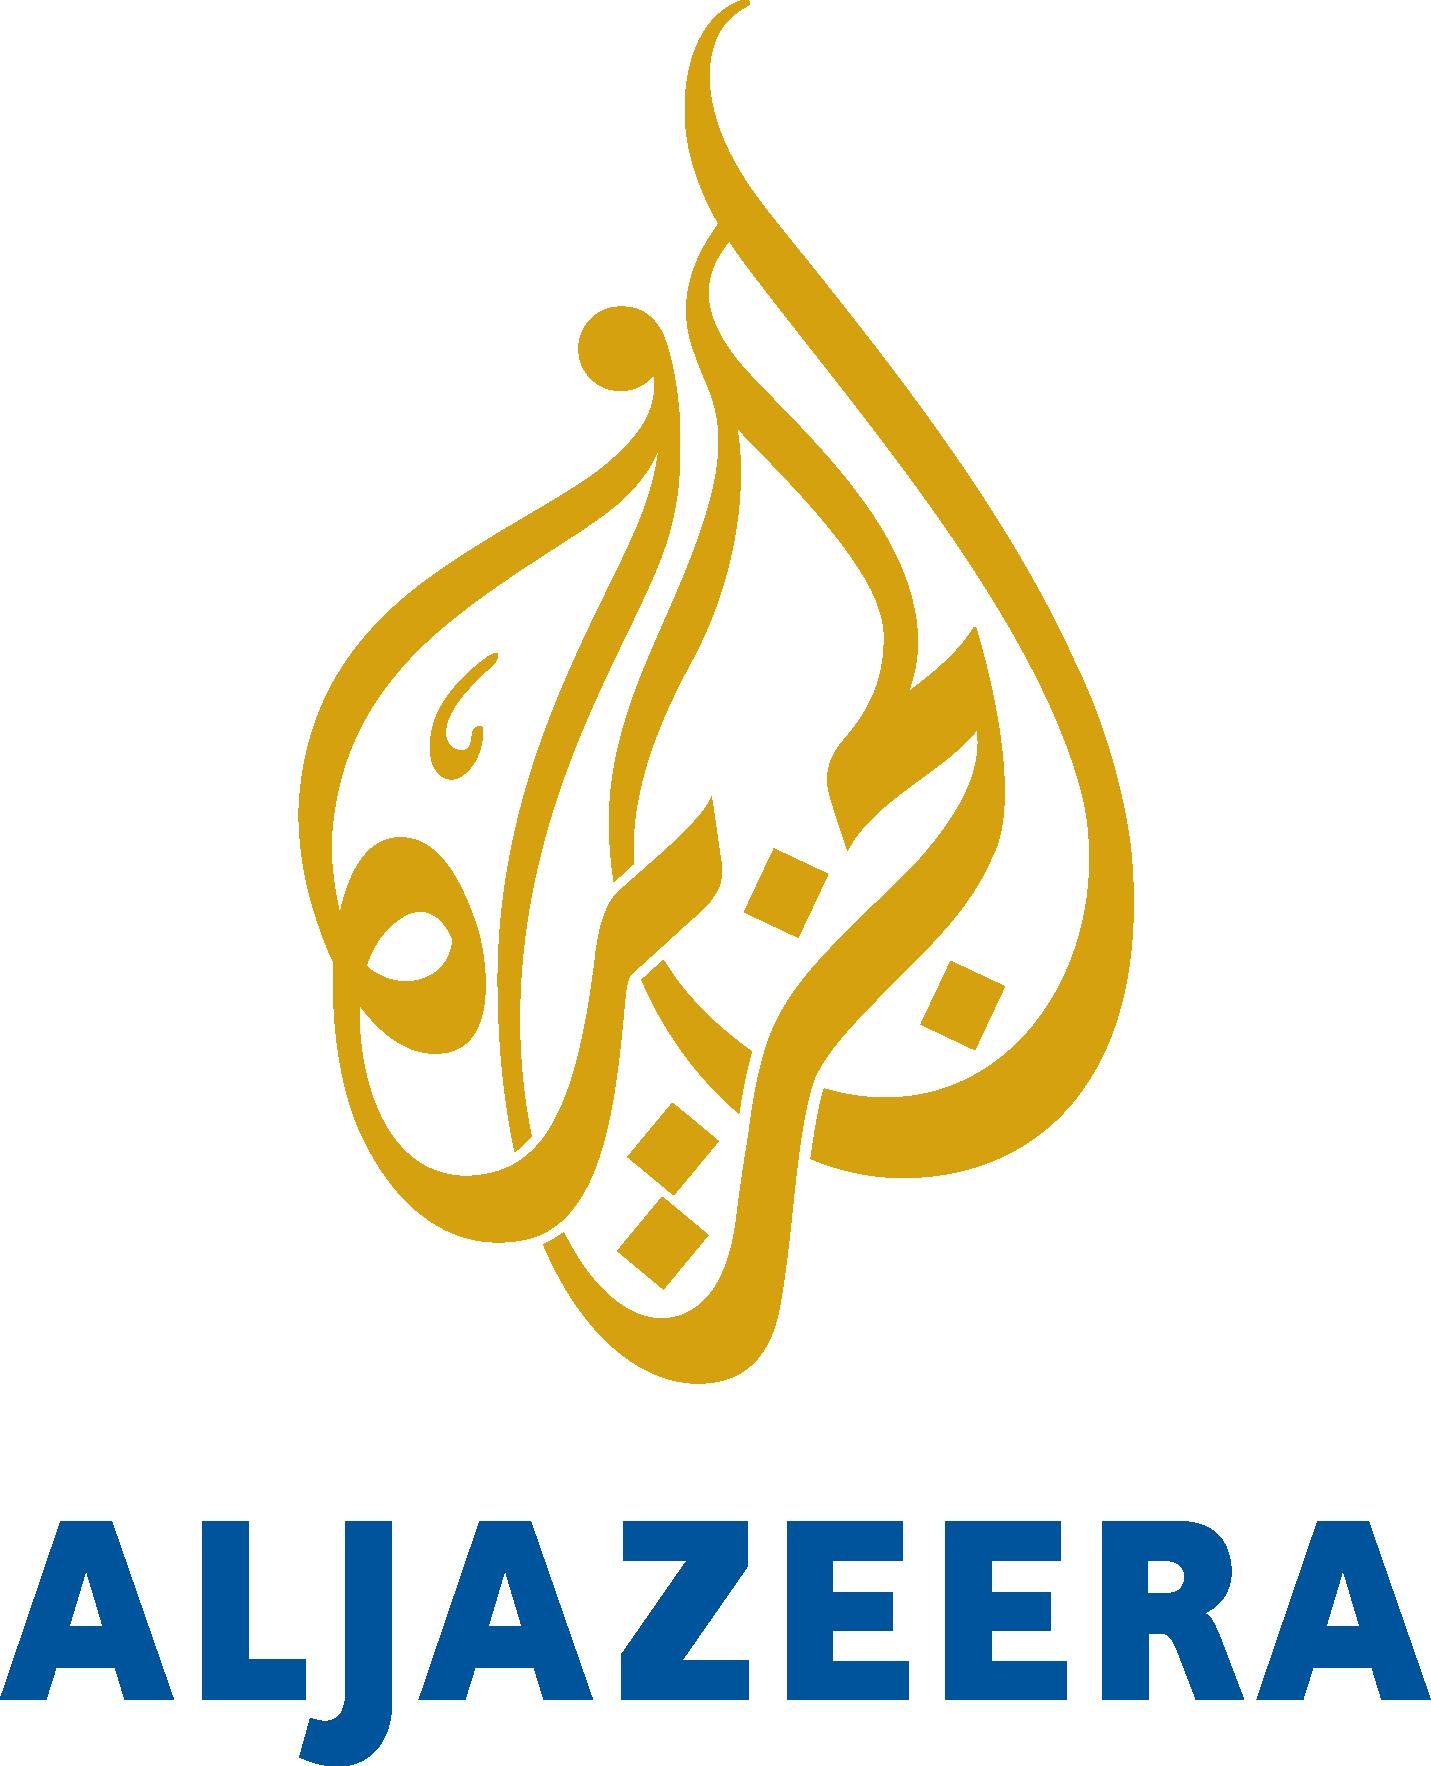 al-jazeera-png-al-jazeera-logo-1431